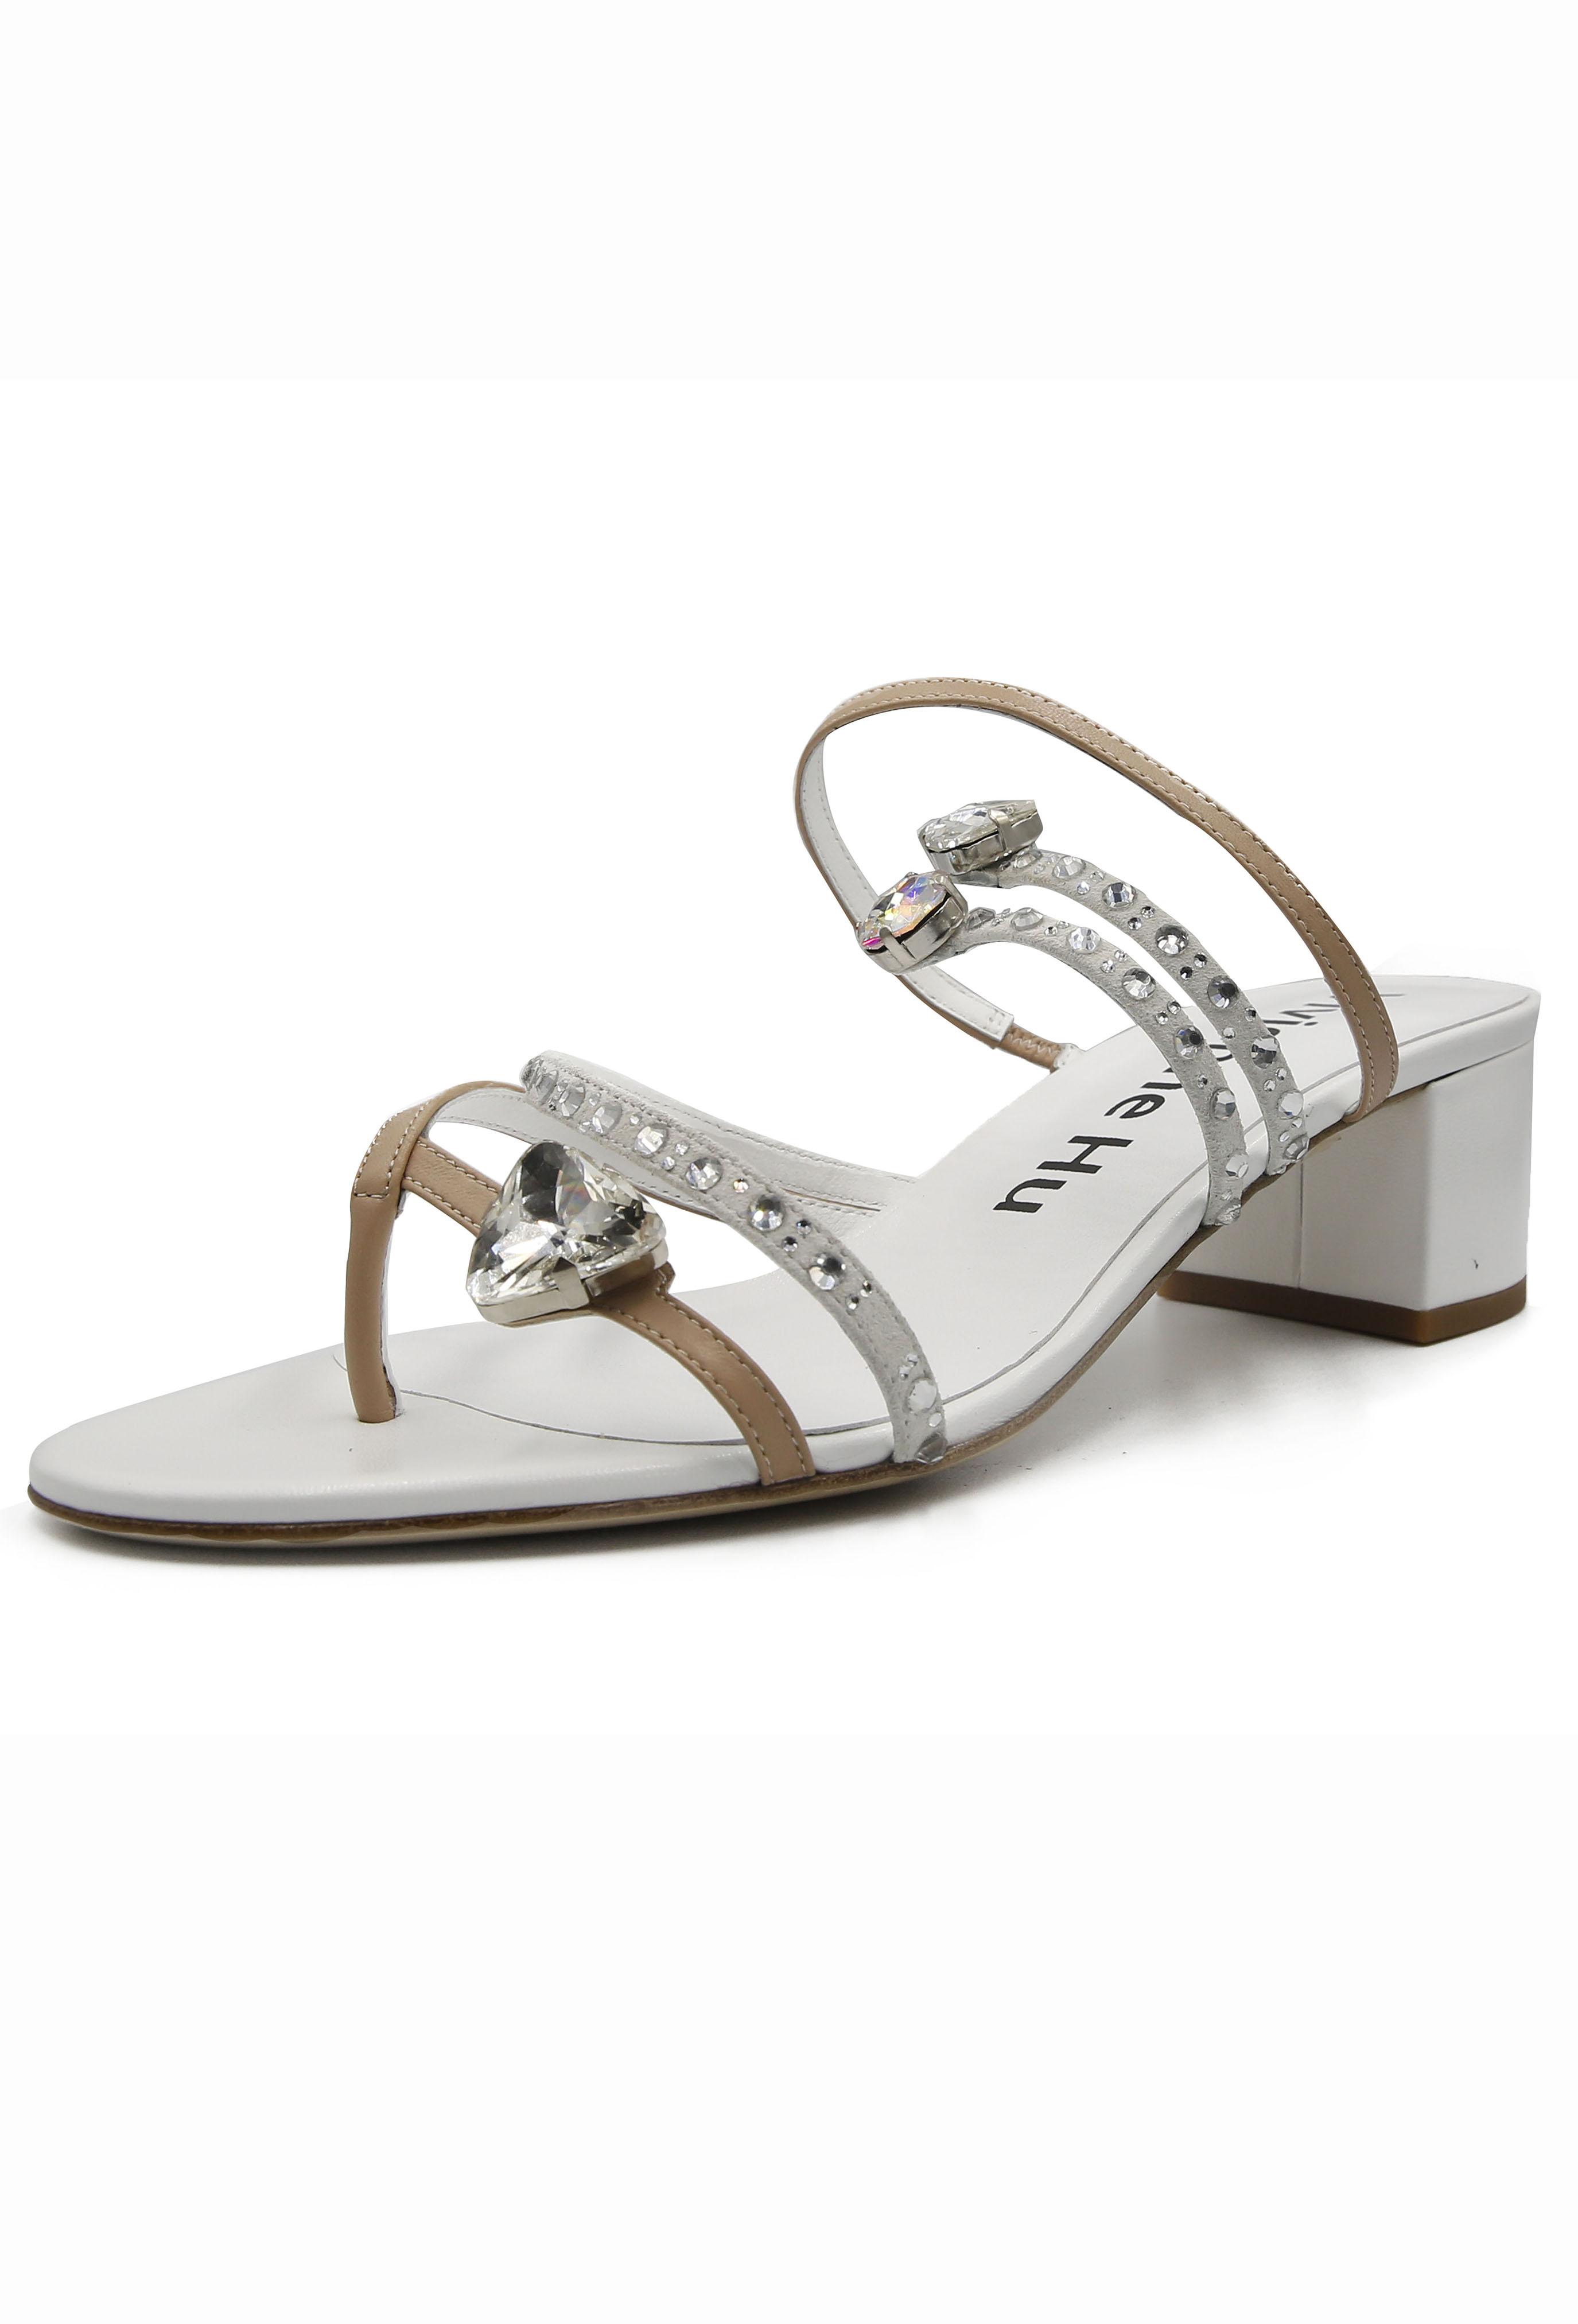 White Estelle Heel Sandles